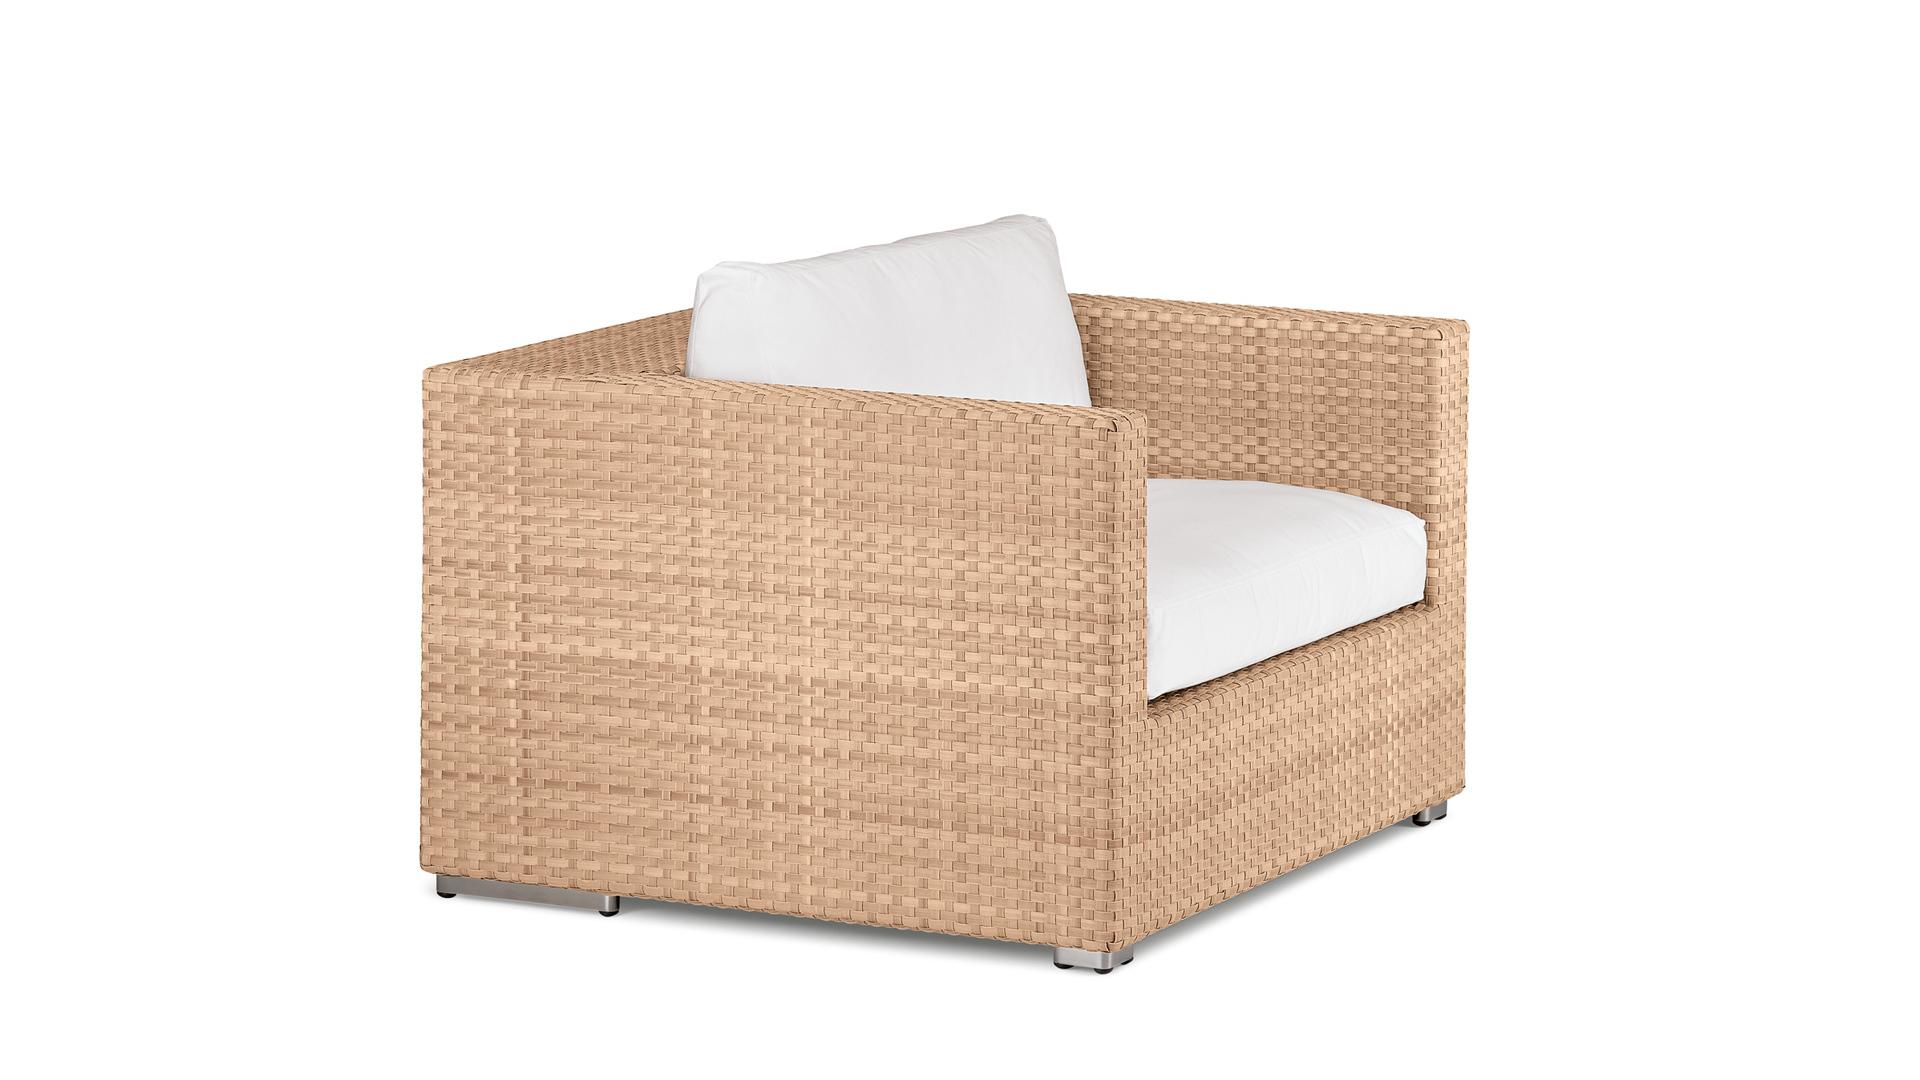 DEDON-LOUNGE-Lounge-chair-1920x1266px.jpg